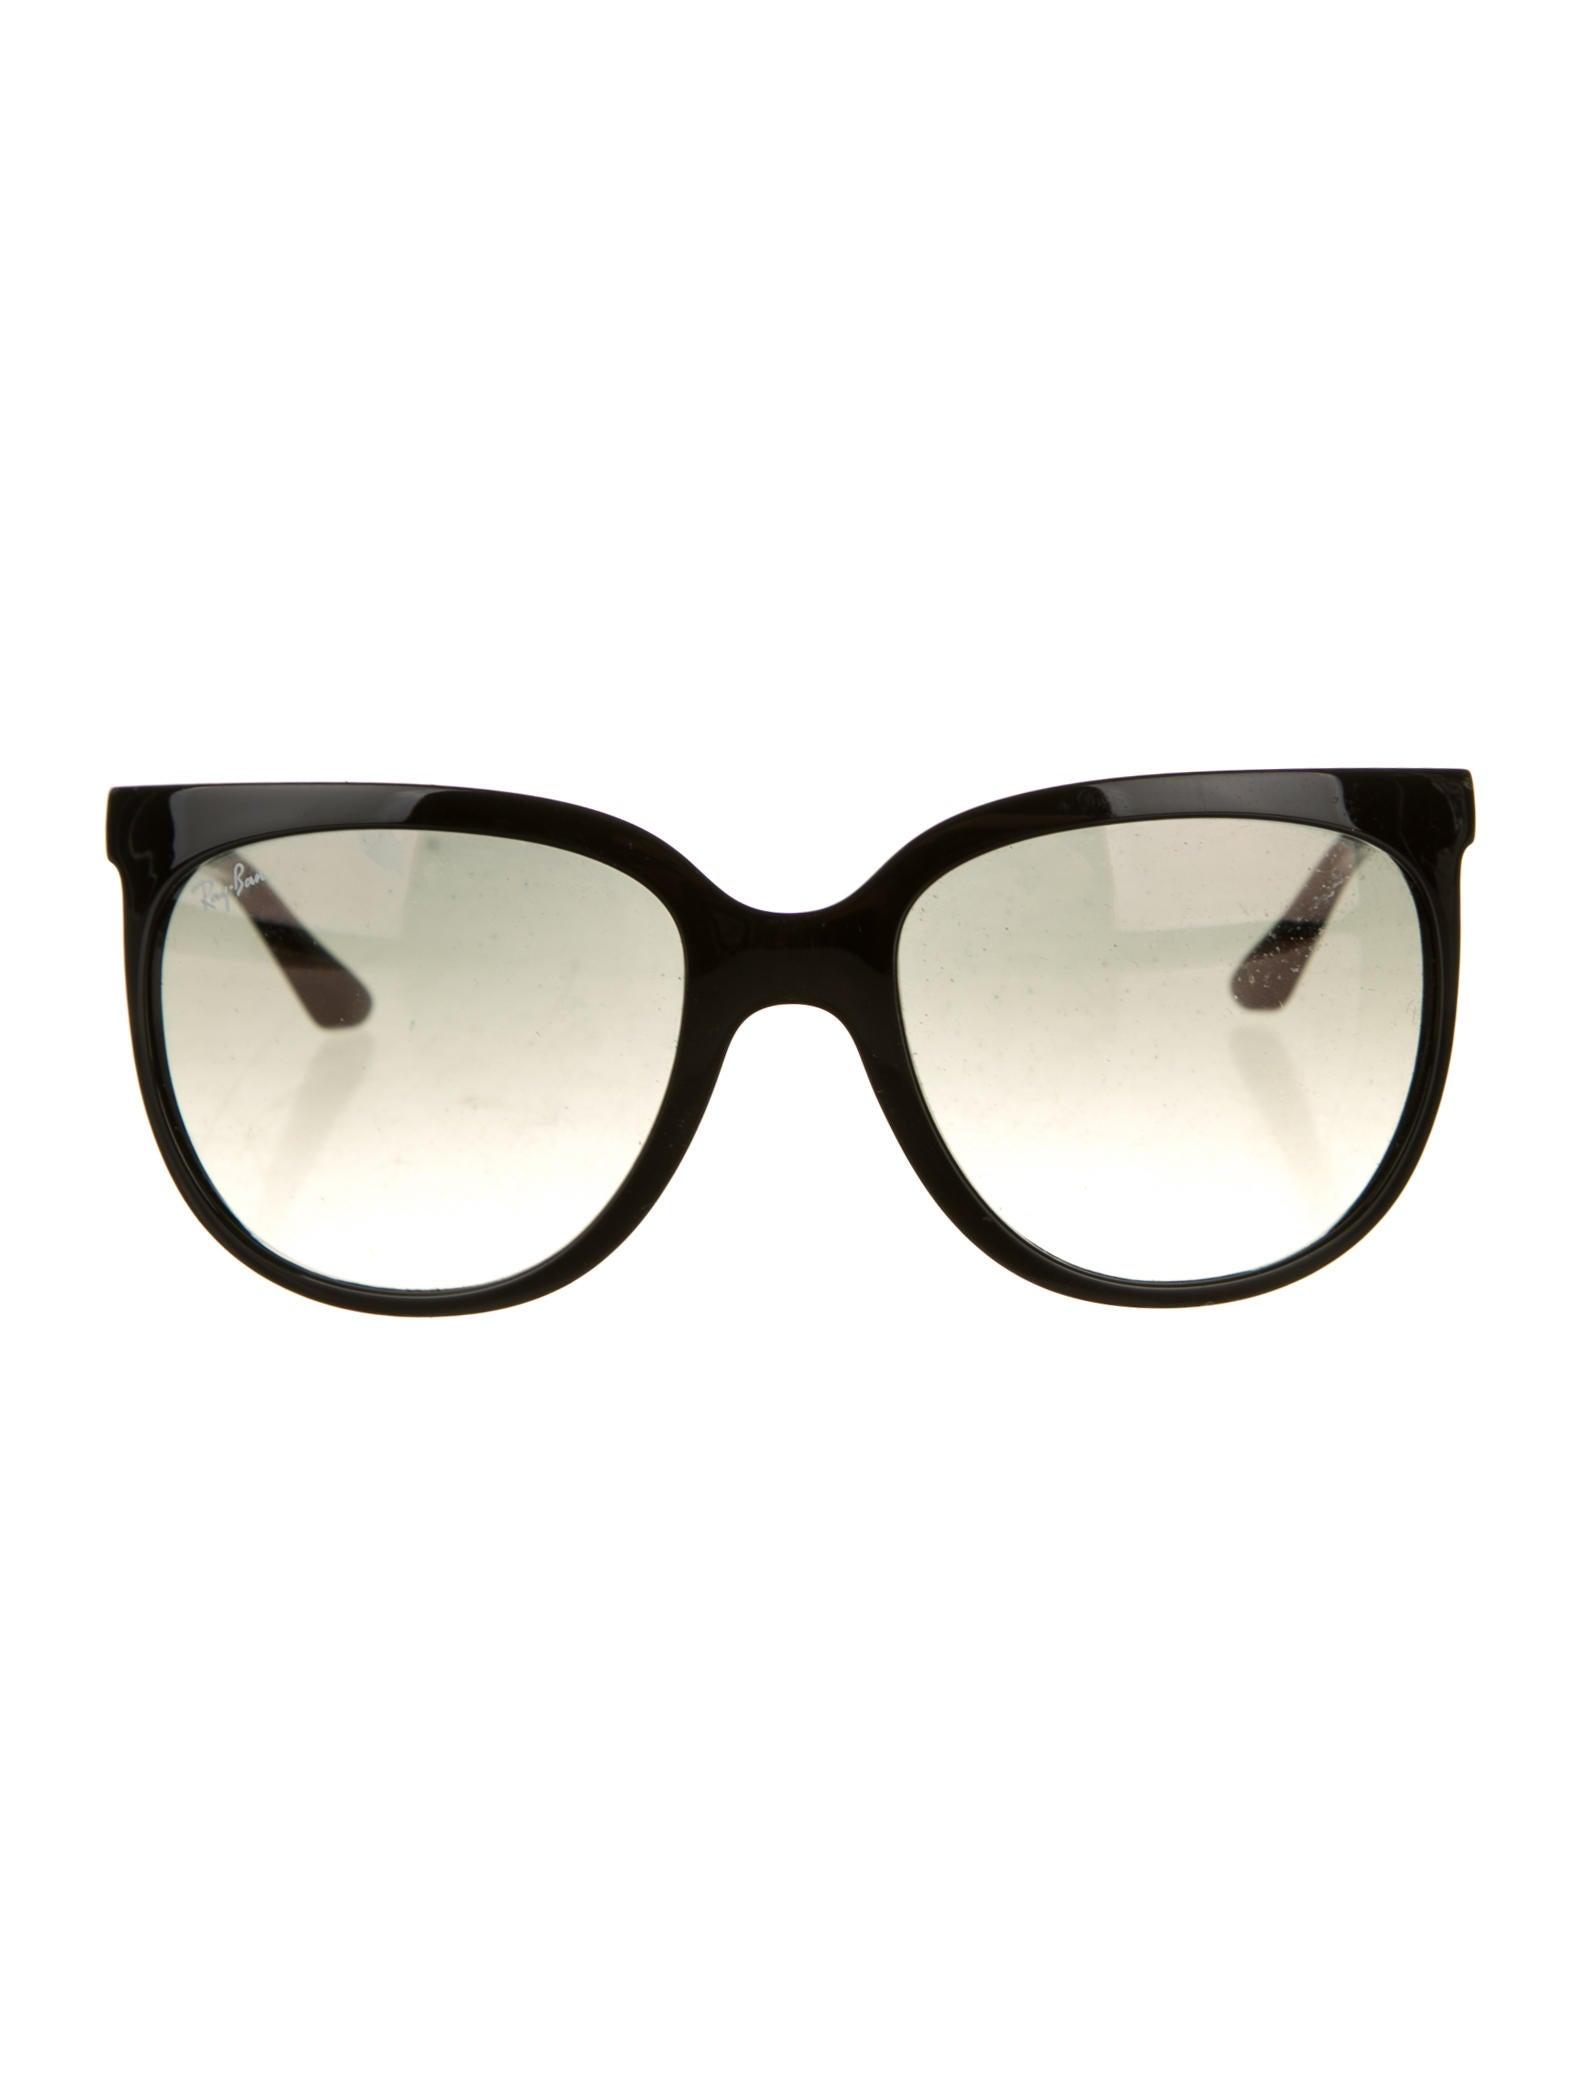 ray ban womens sunglasses sale